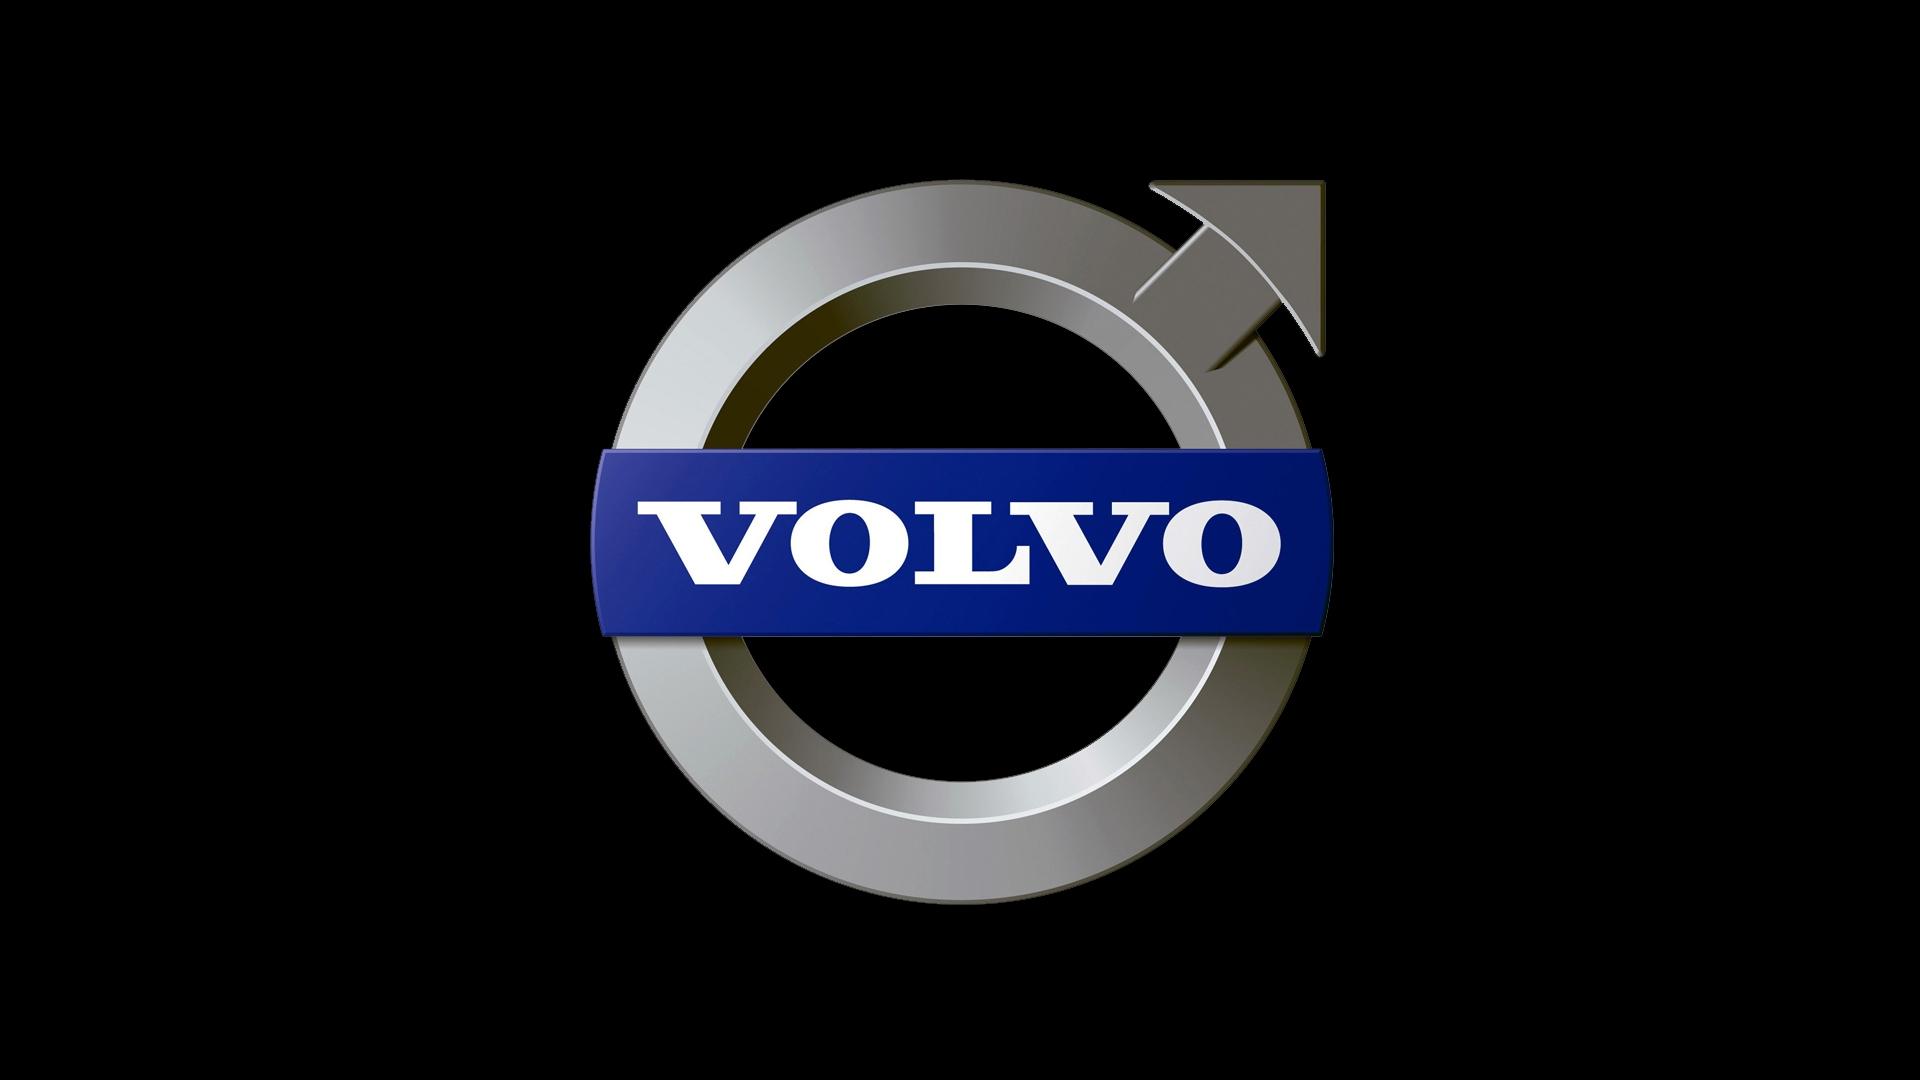 Volvo Logo Wallpaper   HD Wallpapers 1920x1080